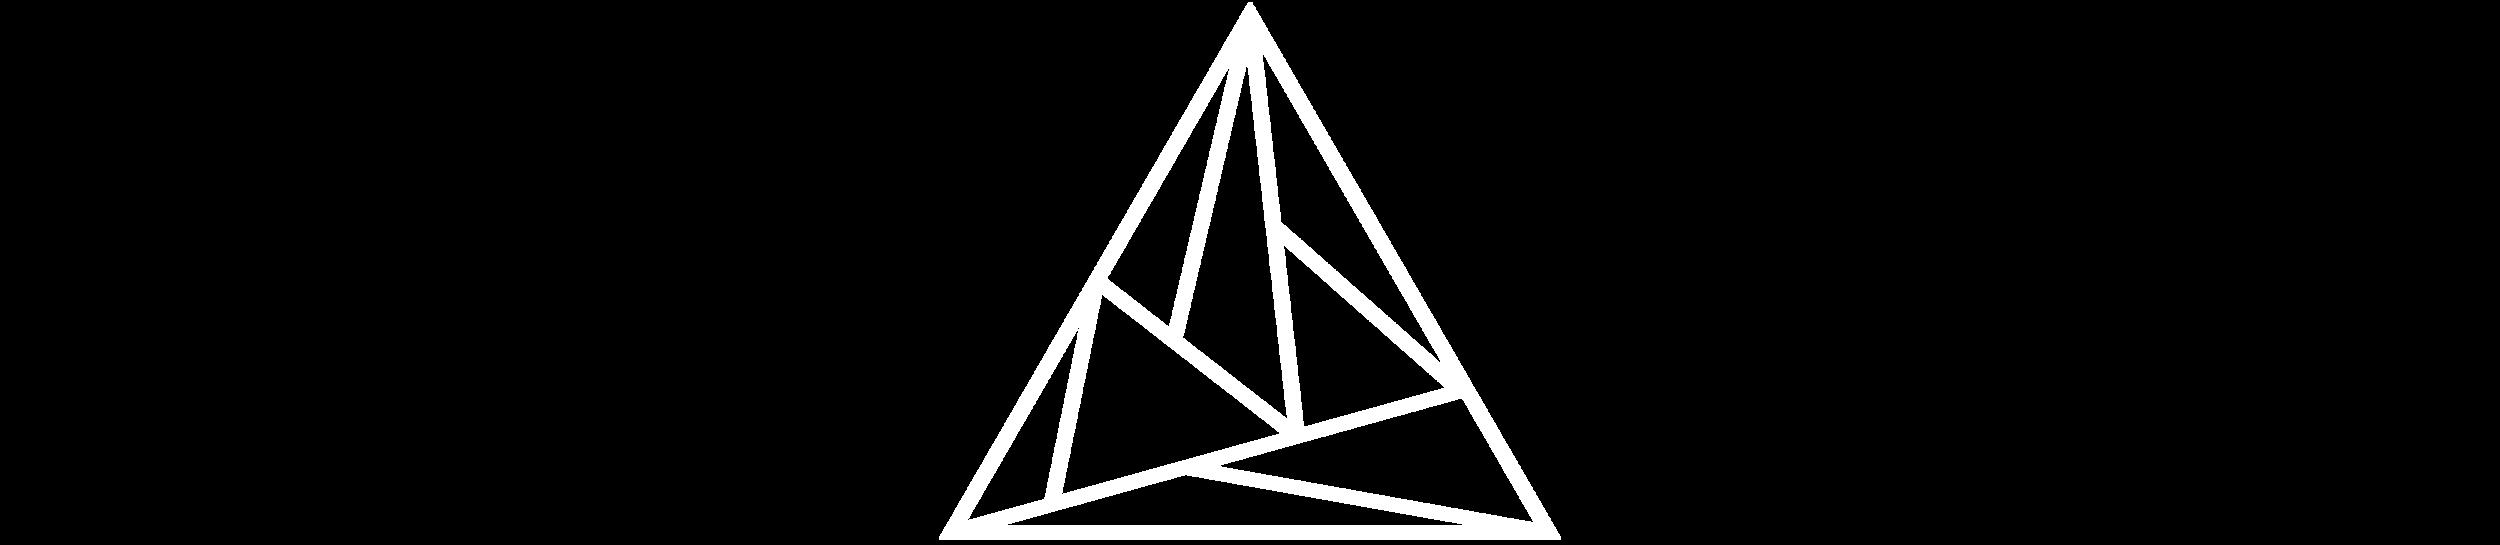 Footer Logo Mark-01.png